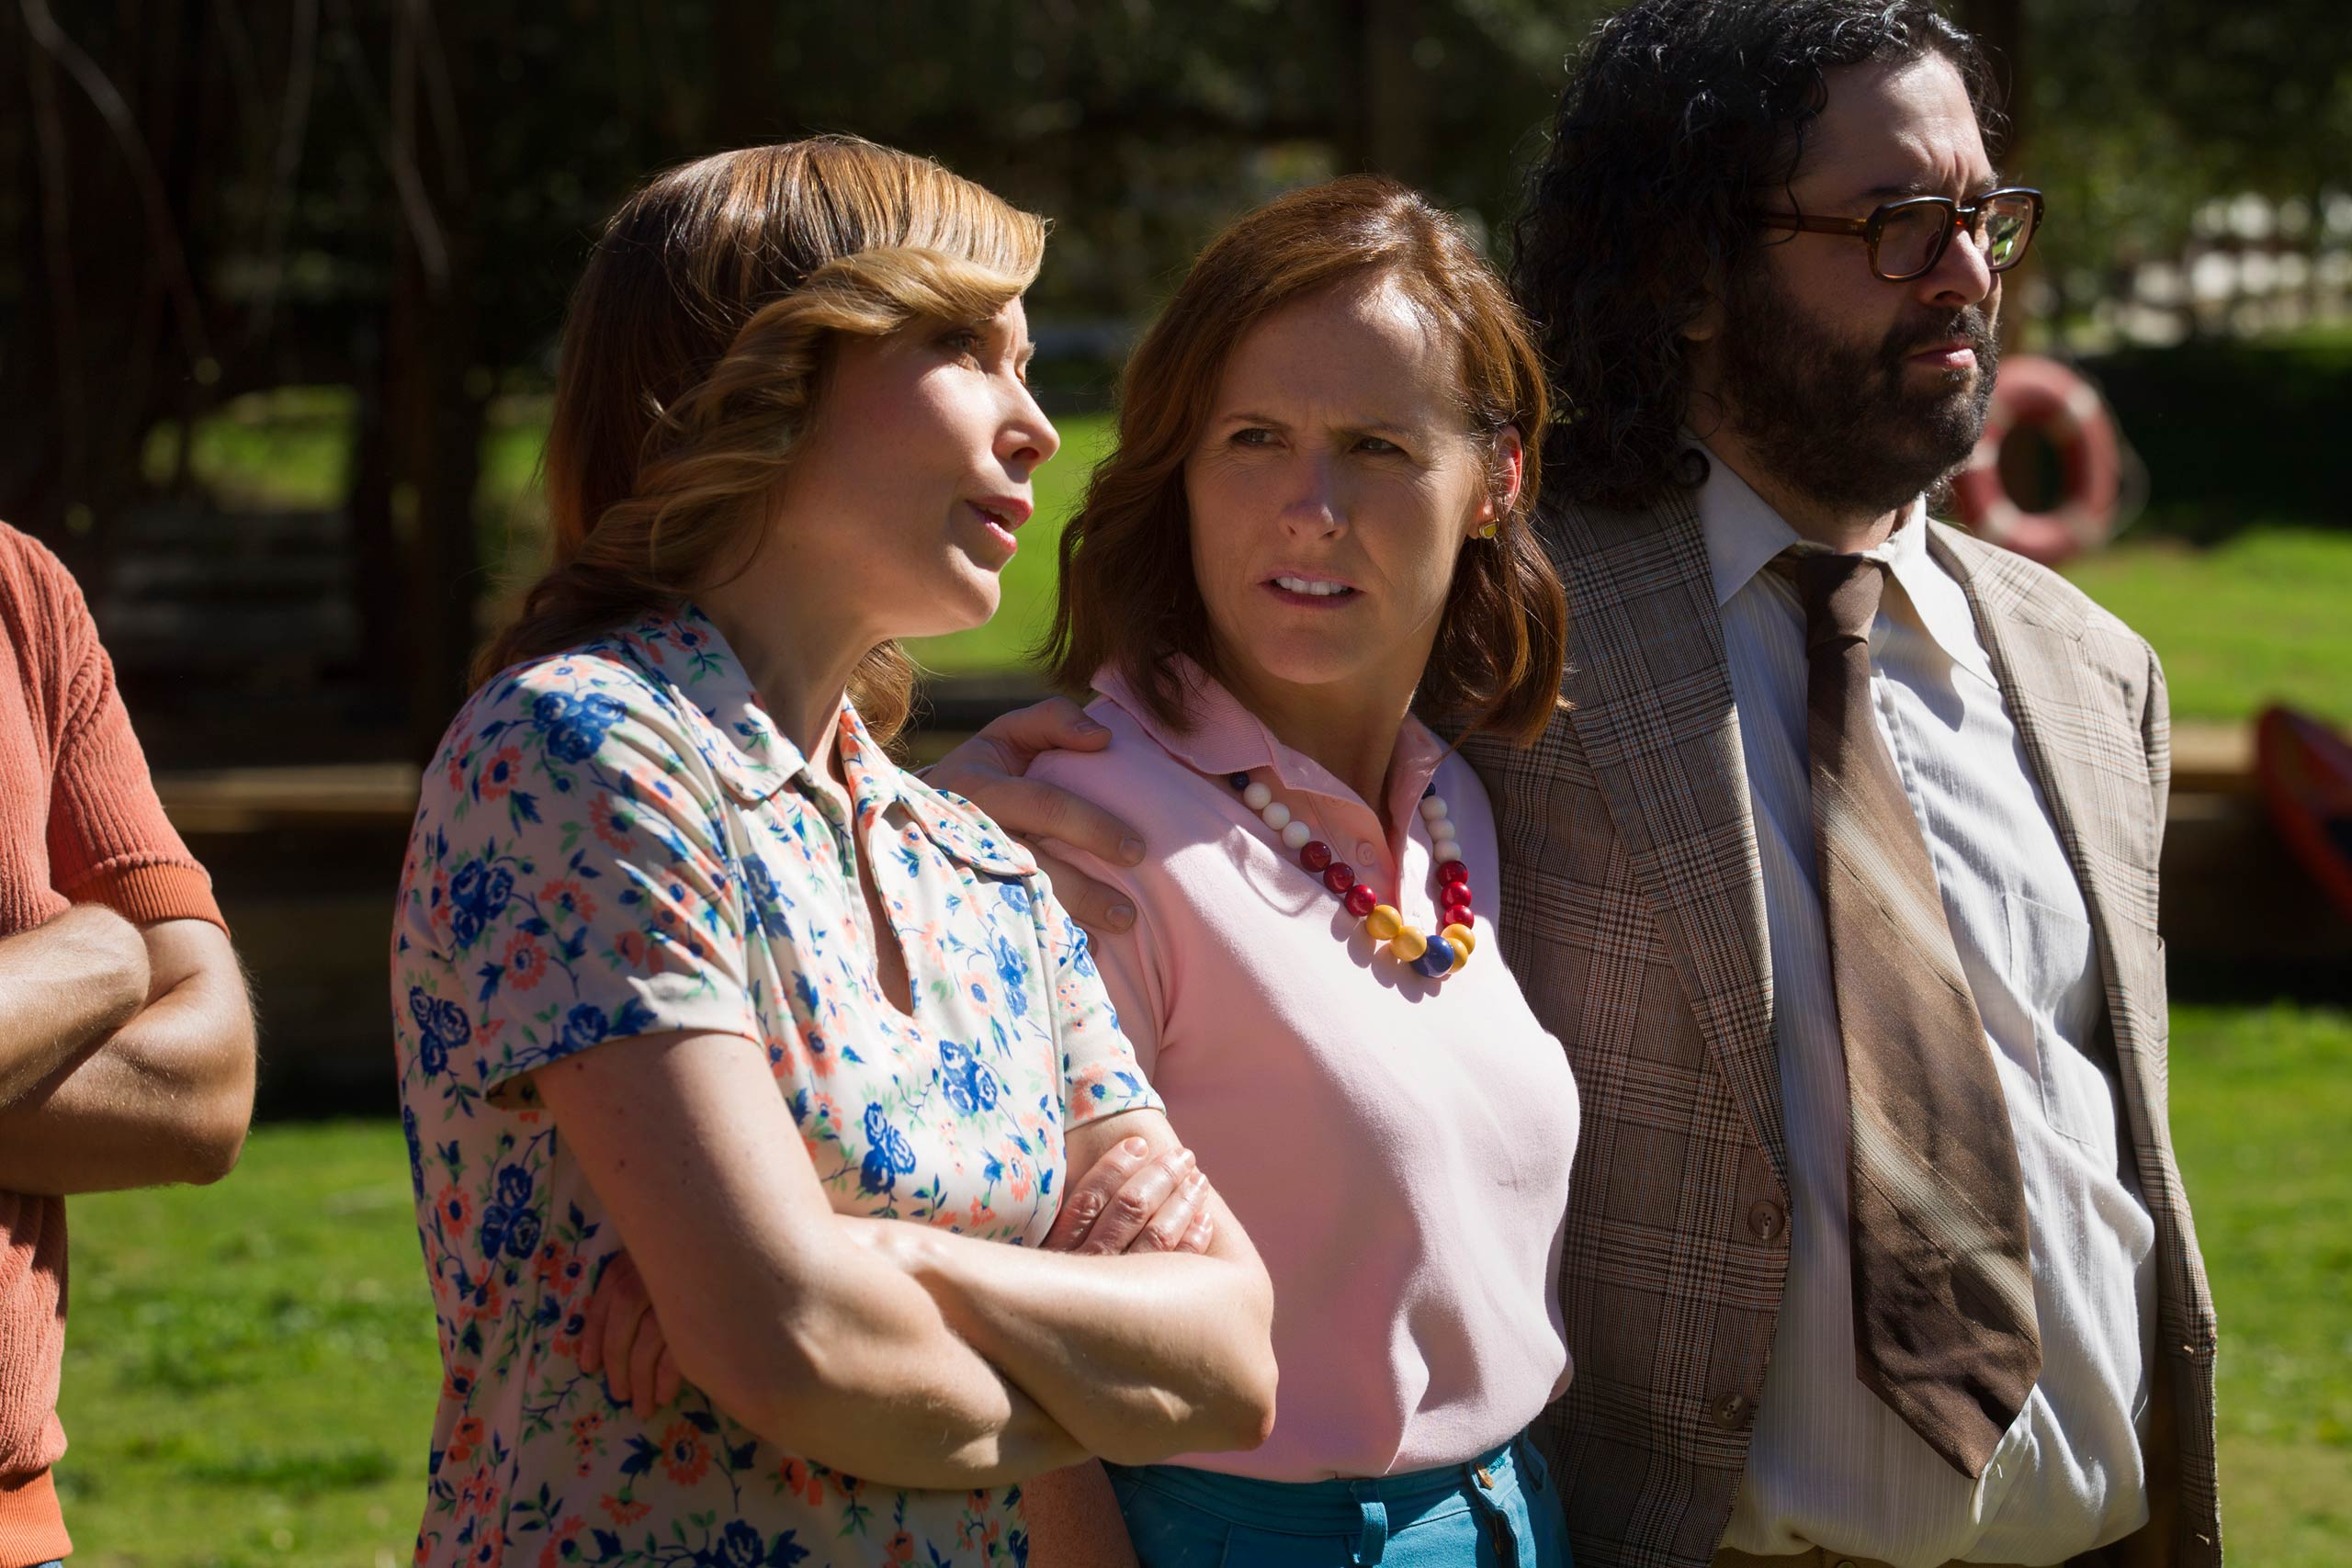 Nina Hellman, Molly Shannon and Judah Friedlander in <i>Wet Hot American Summer: First Day Of Camp</i>